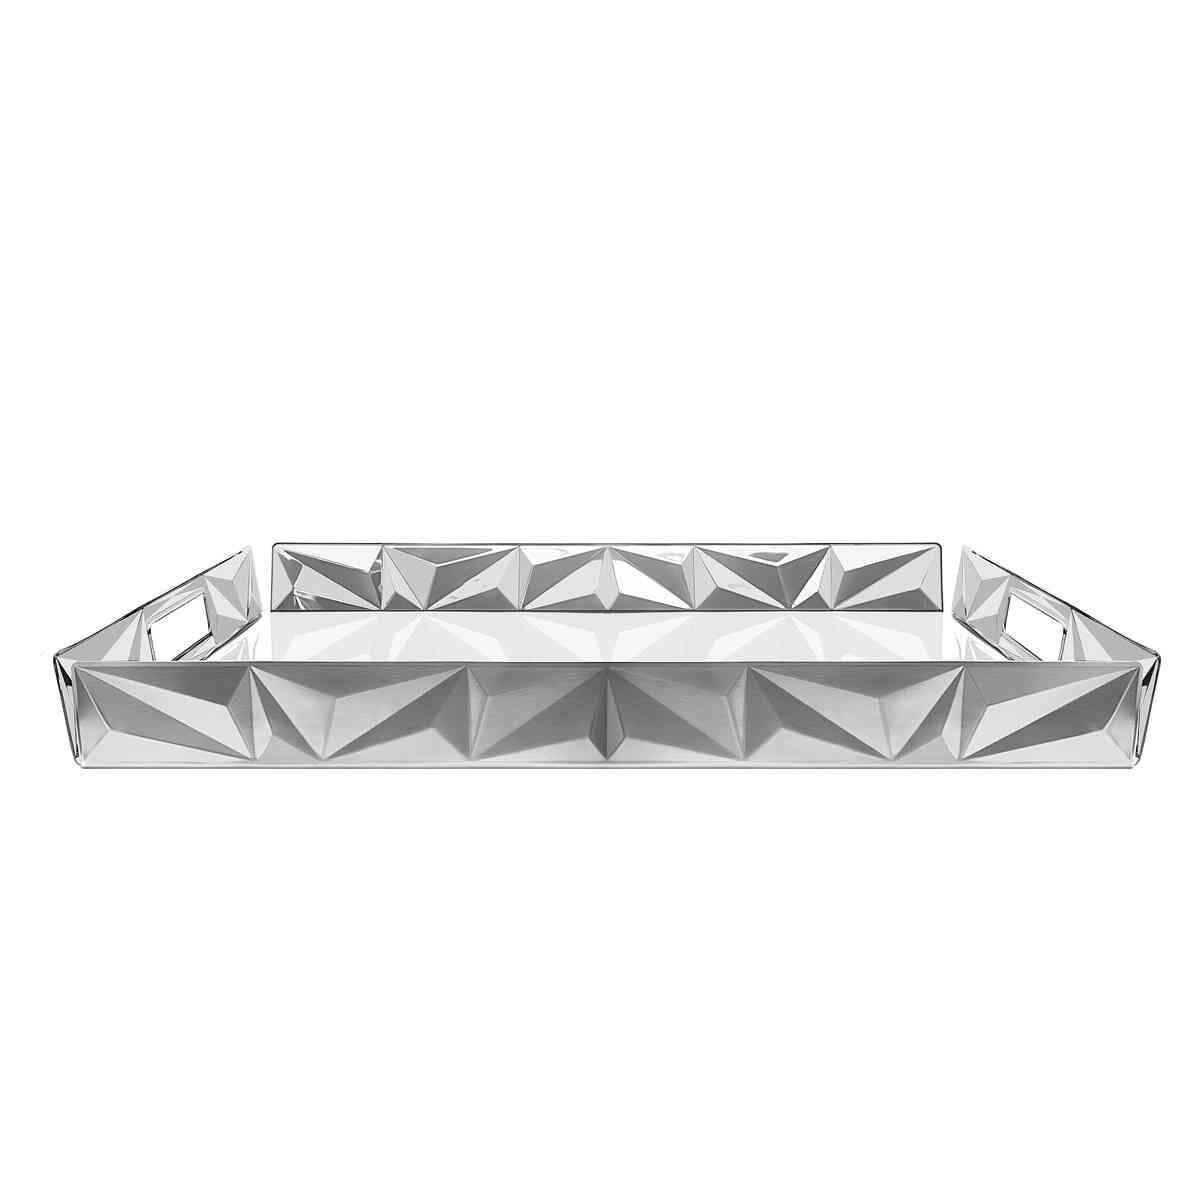 Bandeja retangular aço inox Tramontina 61560530